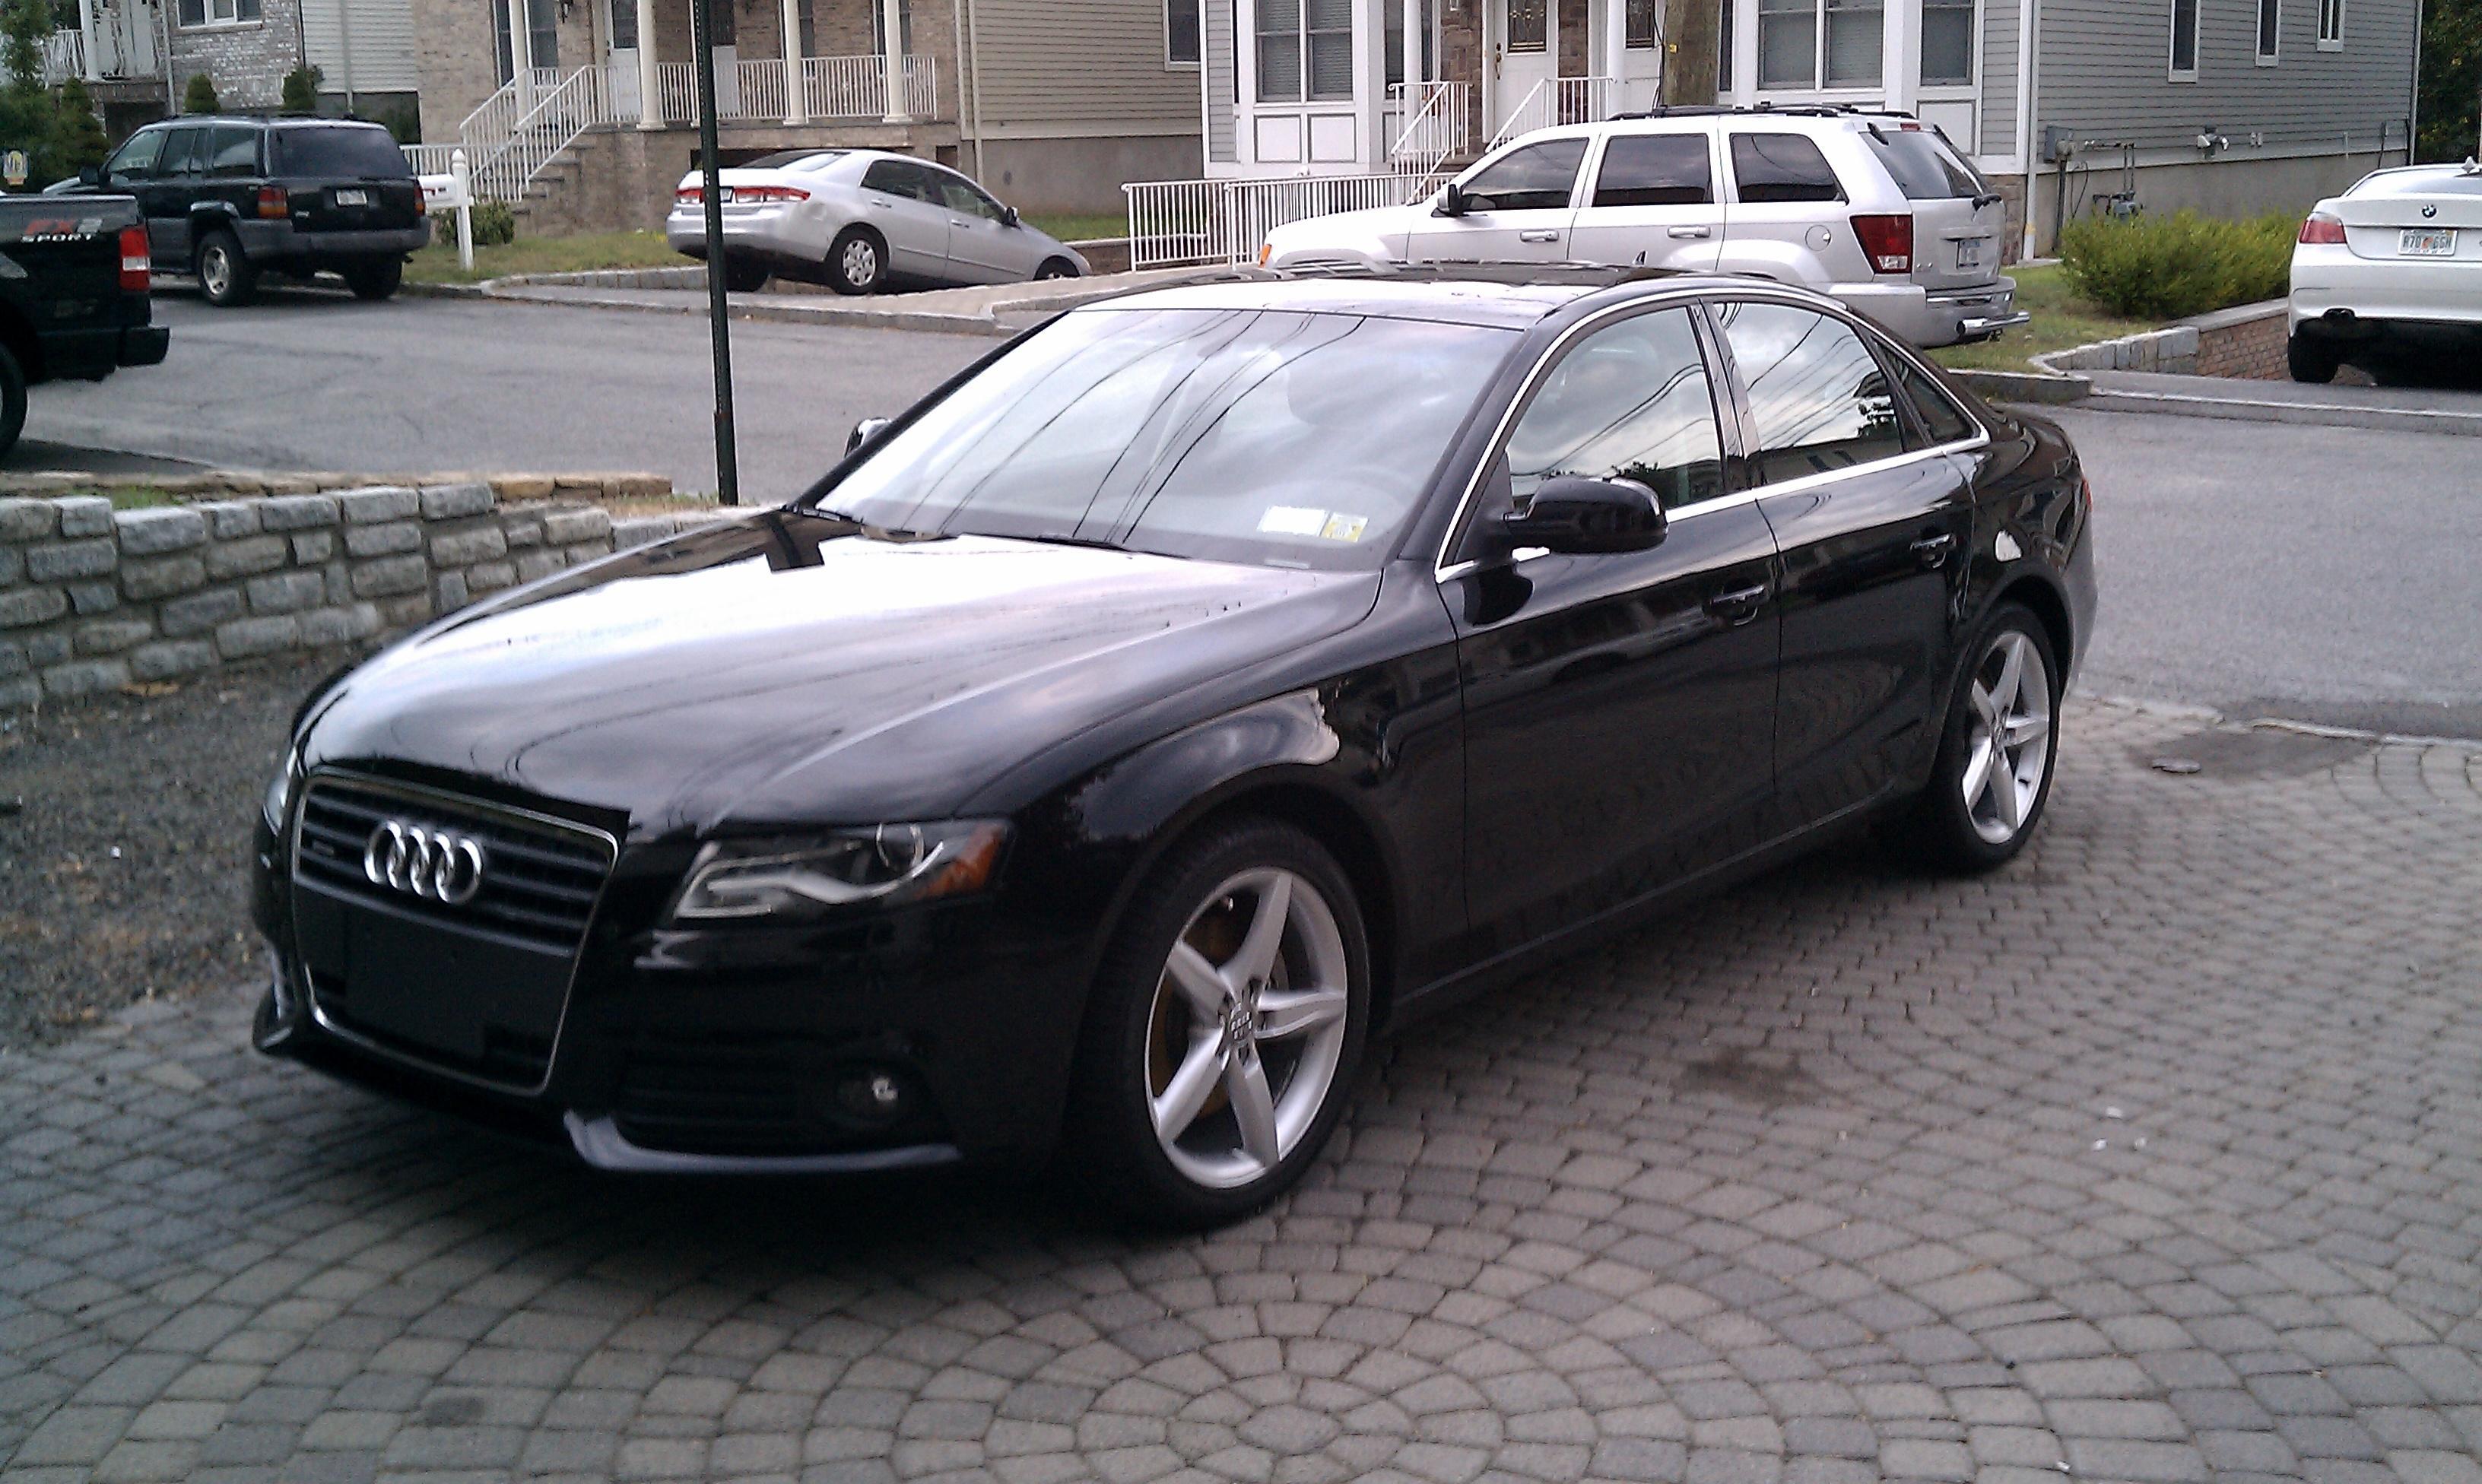 2010 Audi A4 Image 21